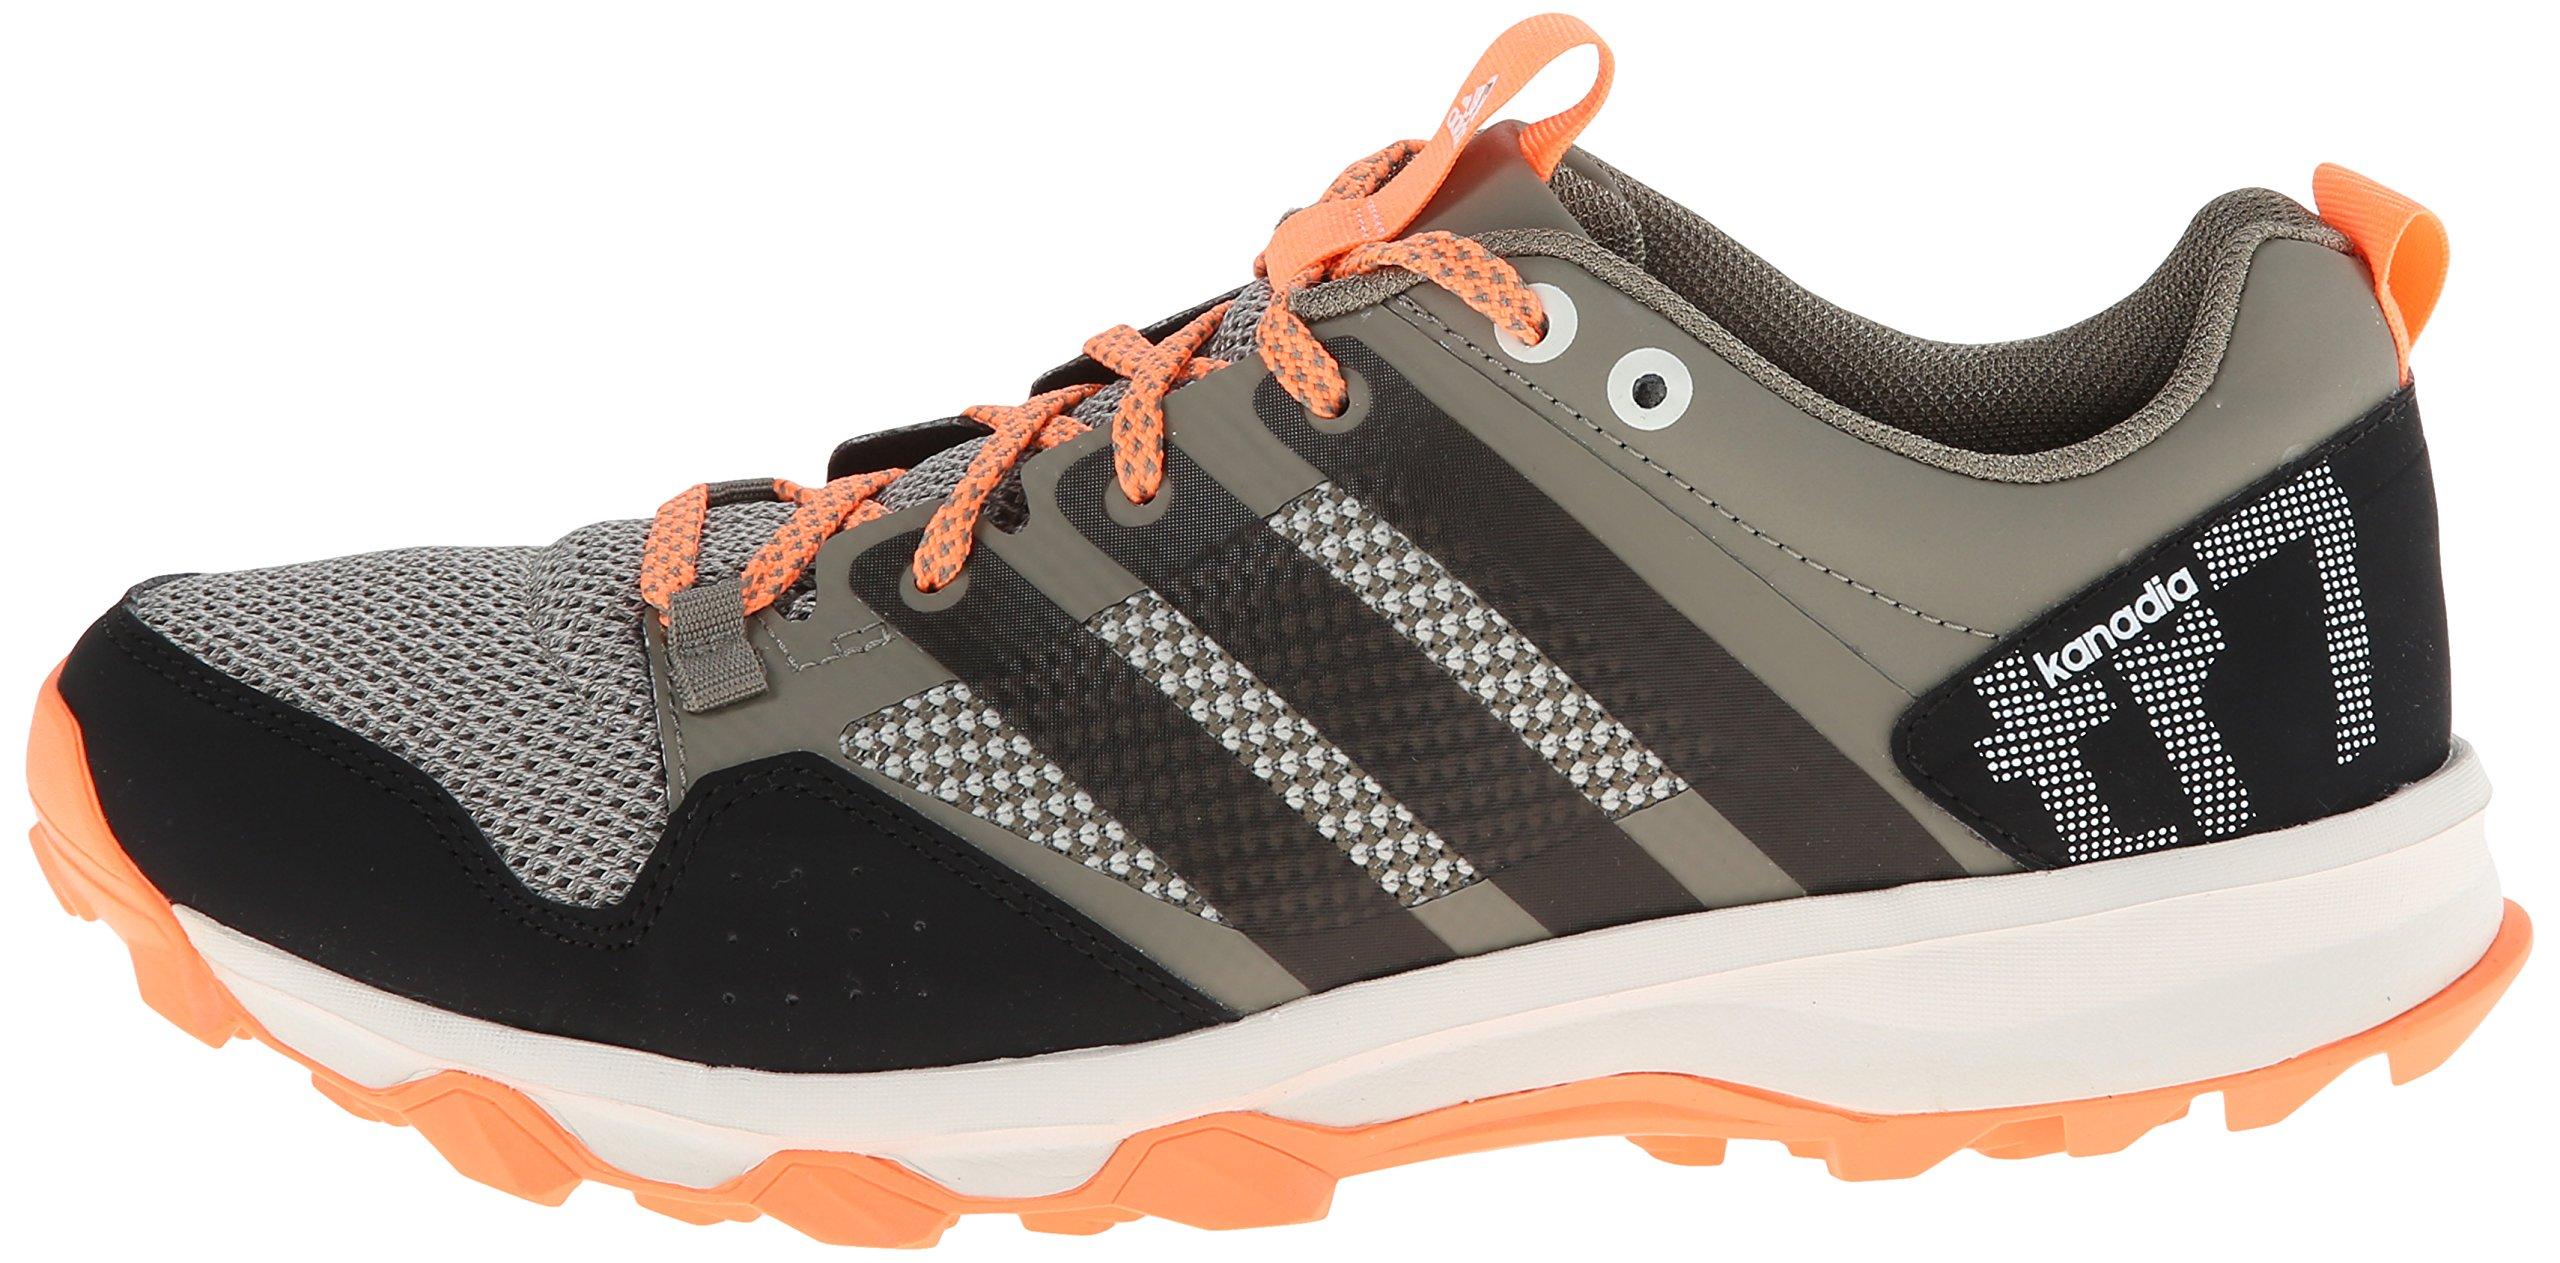 adidas Performance Women's Kanadia 7 TR W Trail Running Shoe, Clay/Chalk/Flash Orange, 7 M US by adidas (Image #5)